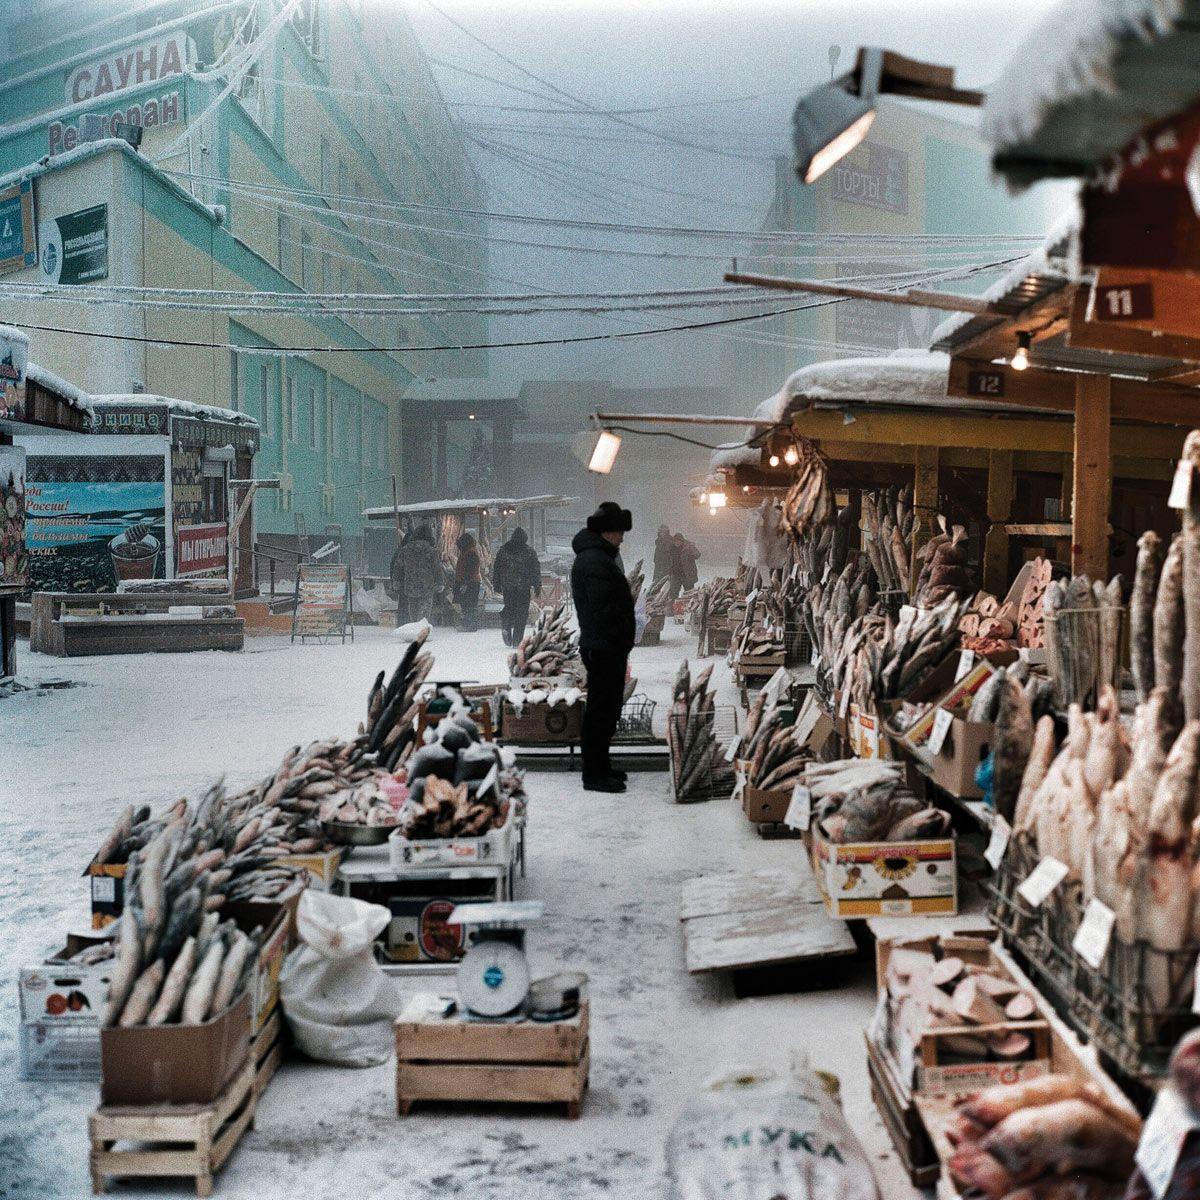 Market World: NO REFRIGERATORS Needed Here. A Fish Market, And Freezing